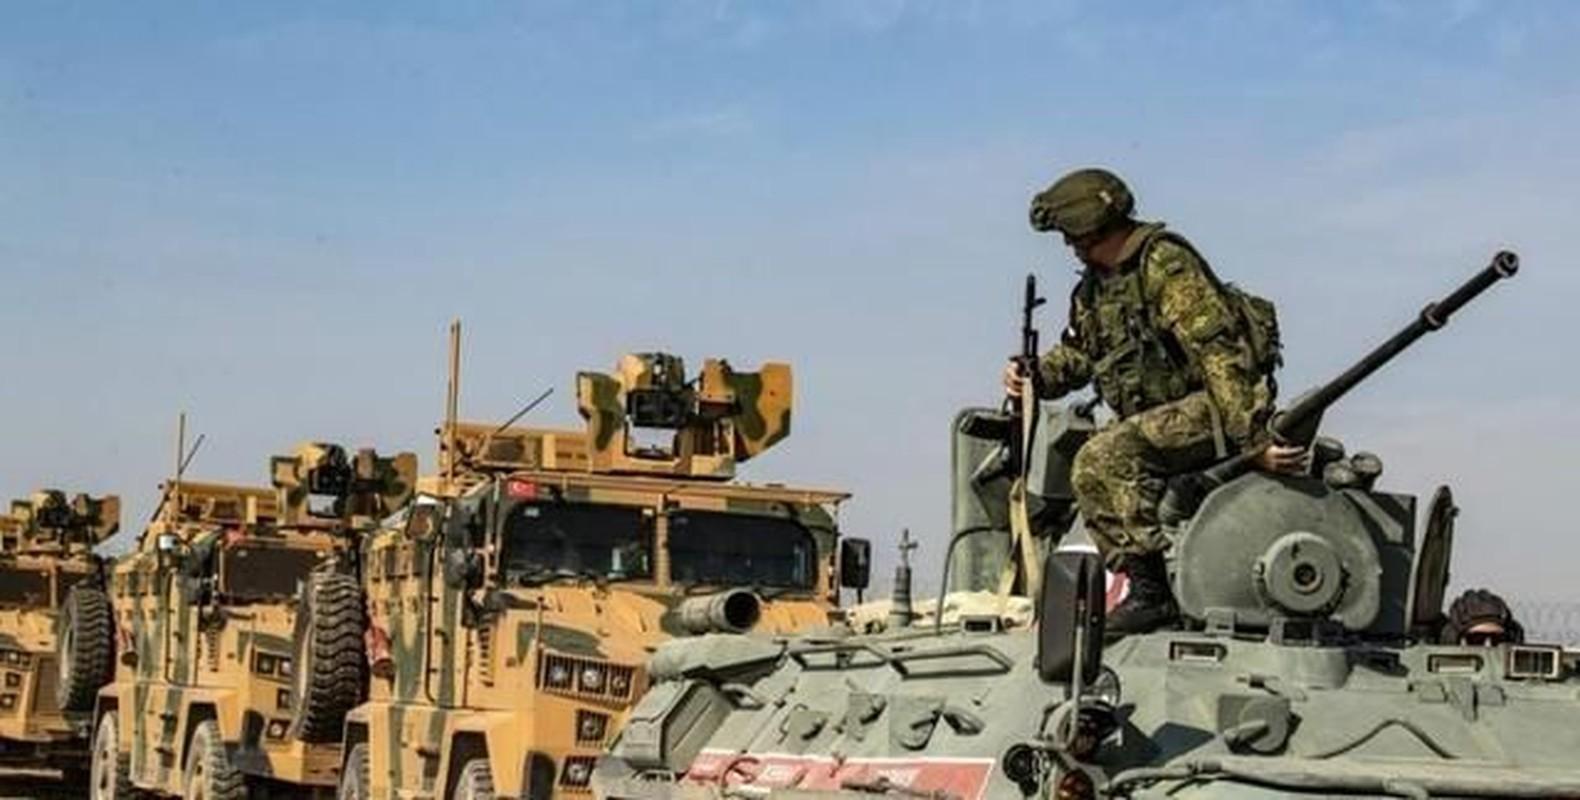 Phien quan khong chiu rut khoi cao toc M4 va the kho cua Tho Nhi Ky o Syria-Hinh-15